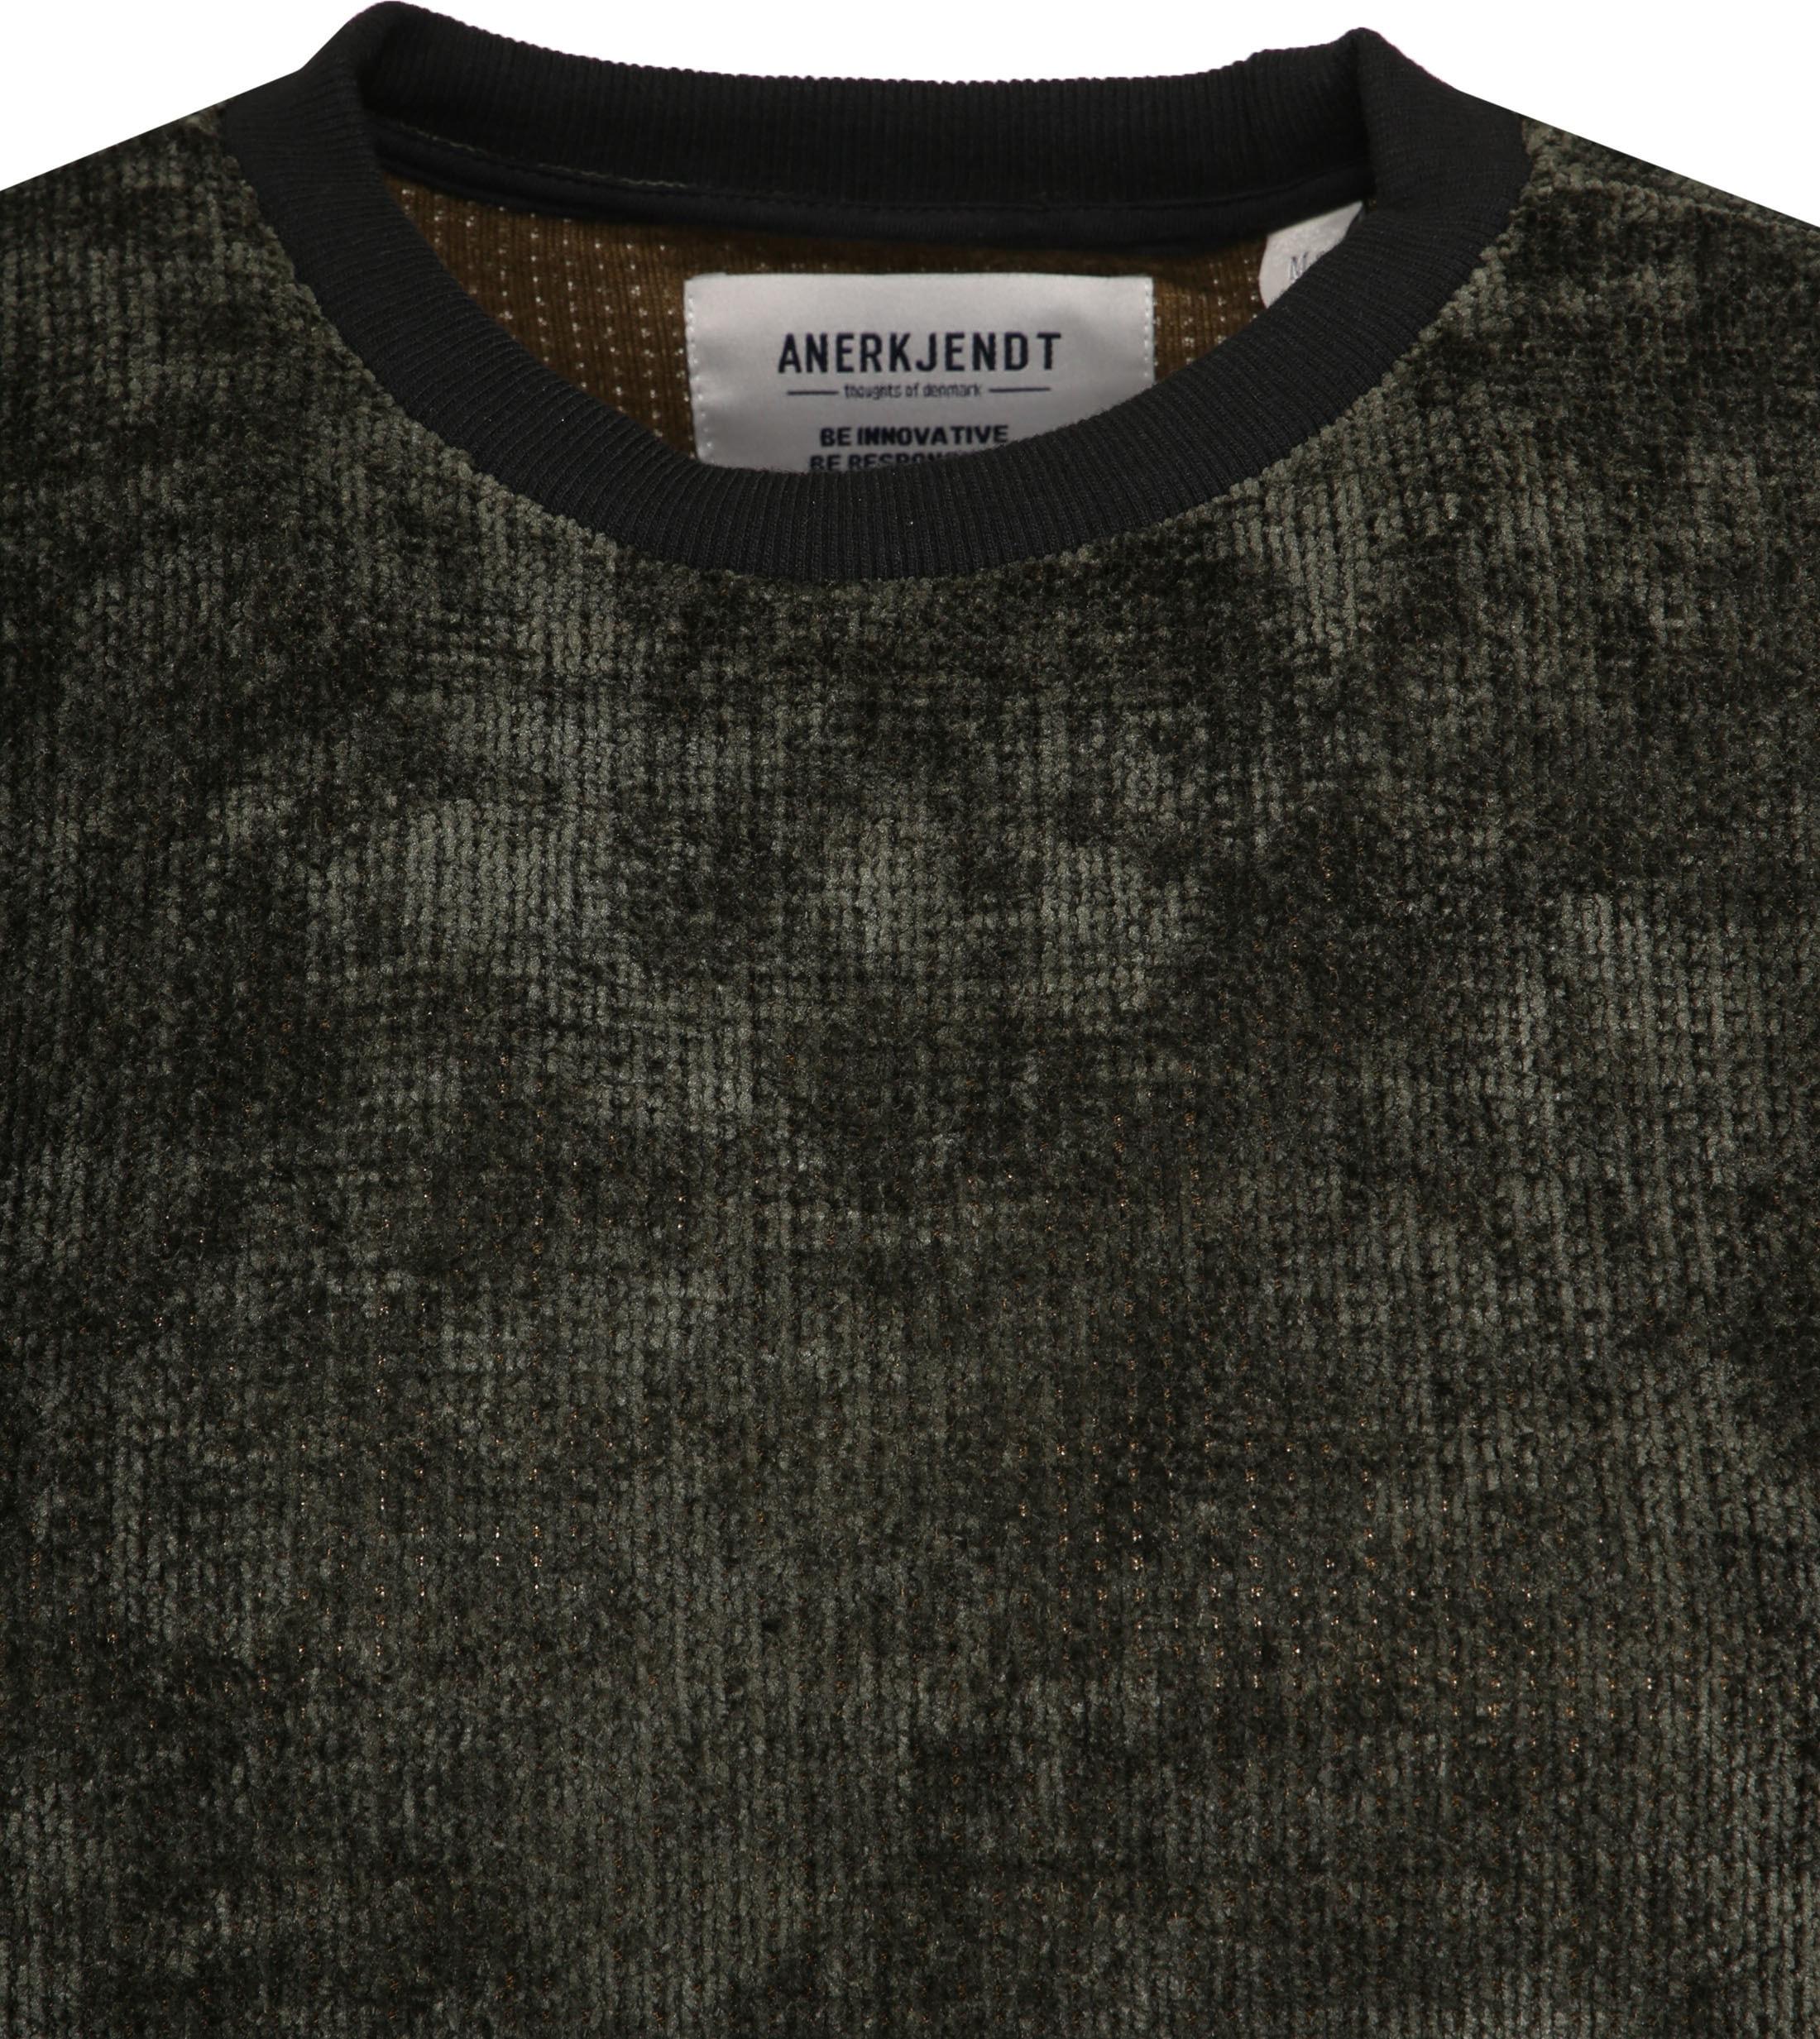 Anerkjendt Akalex Sweater Dunkelgrün foto 1